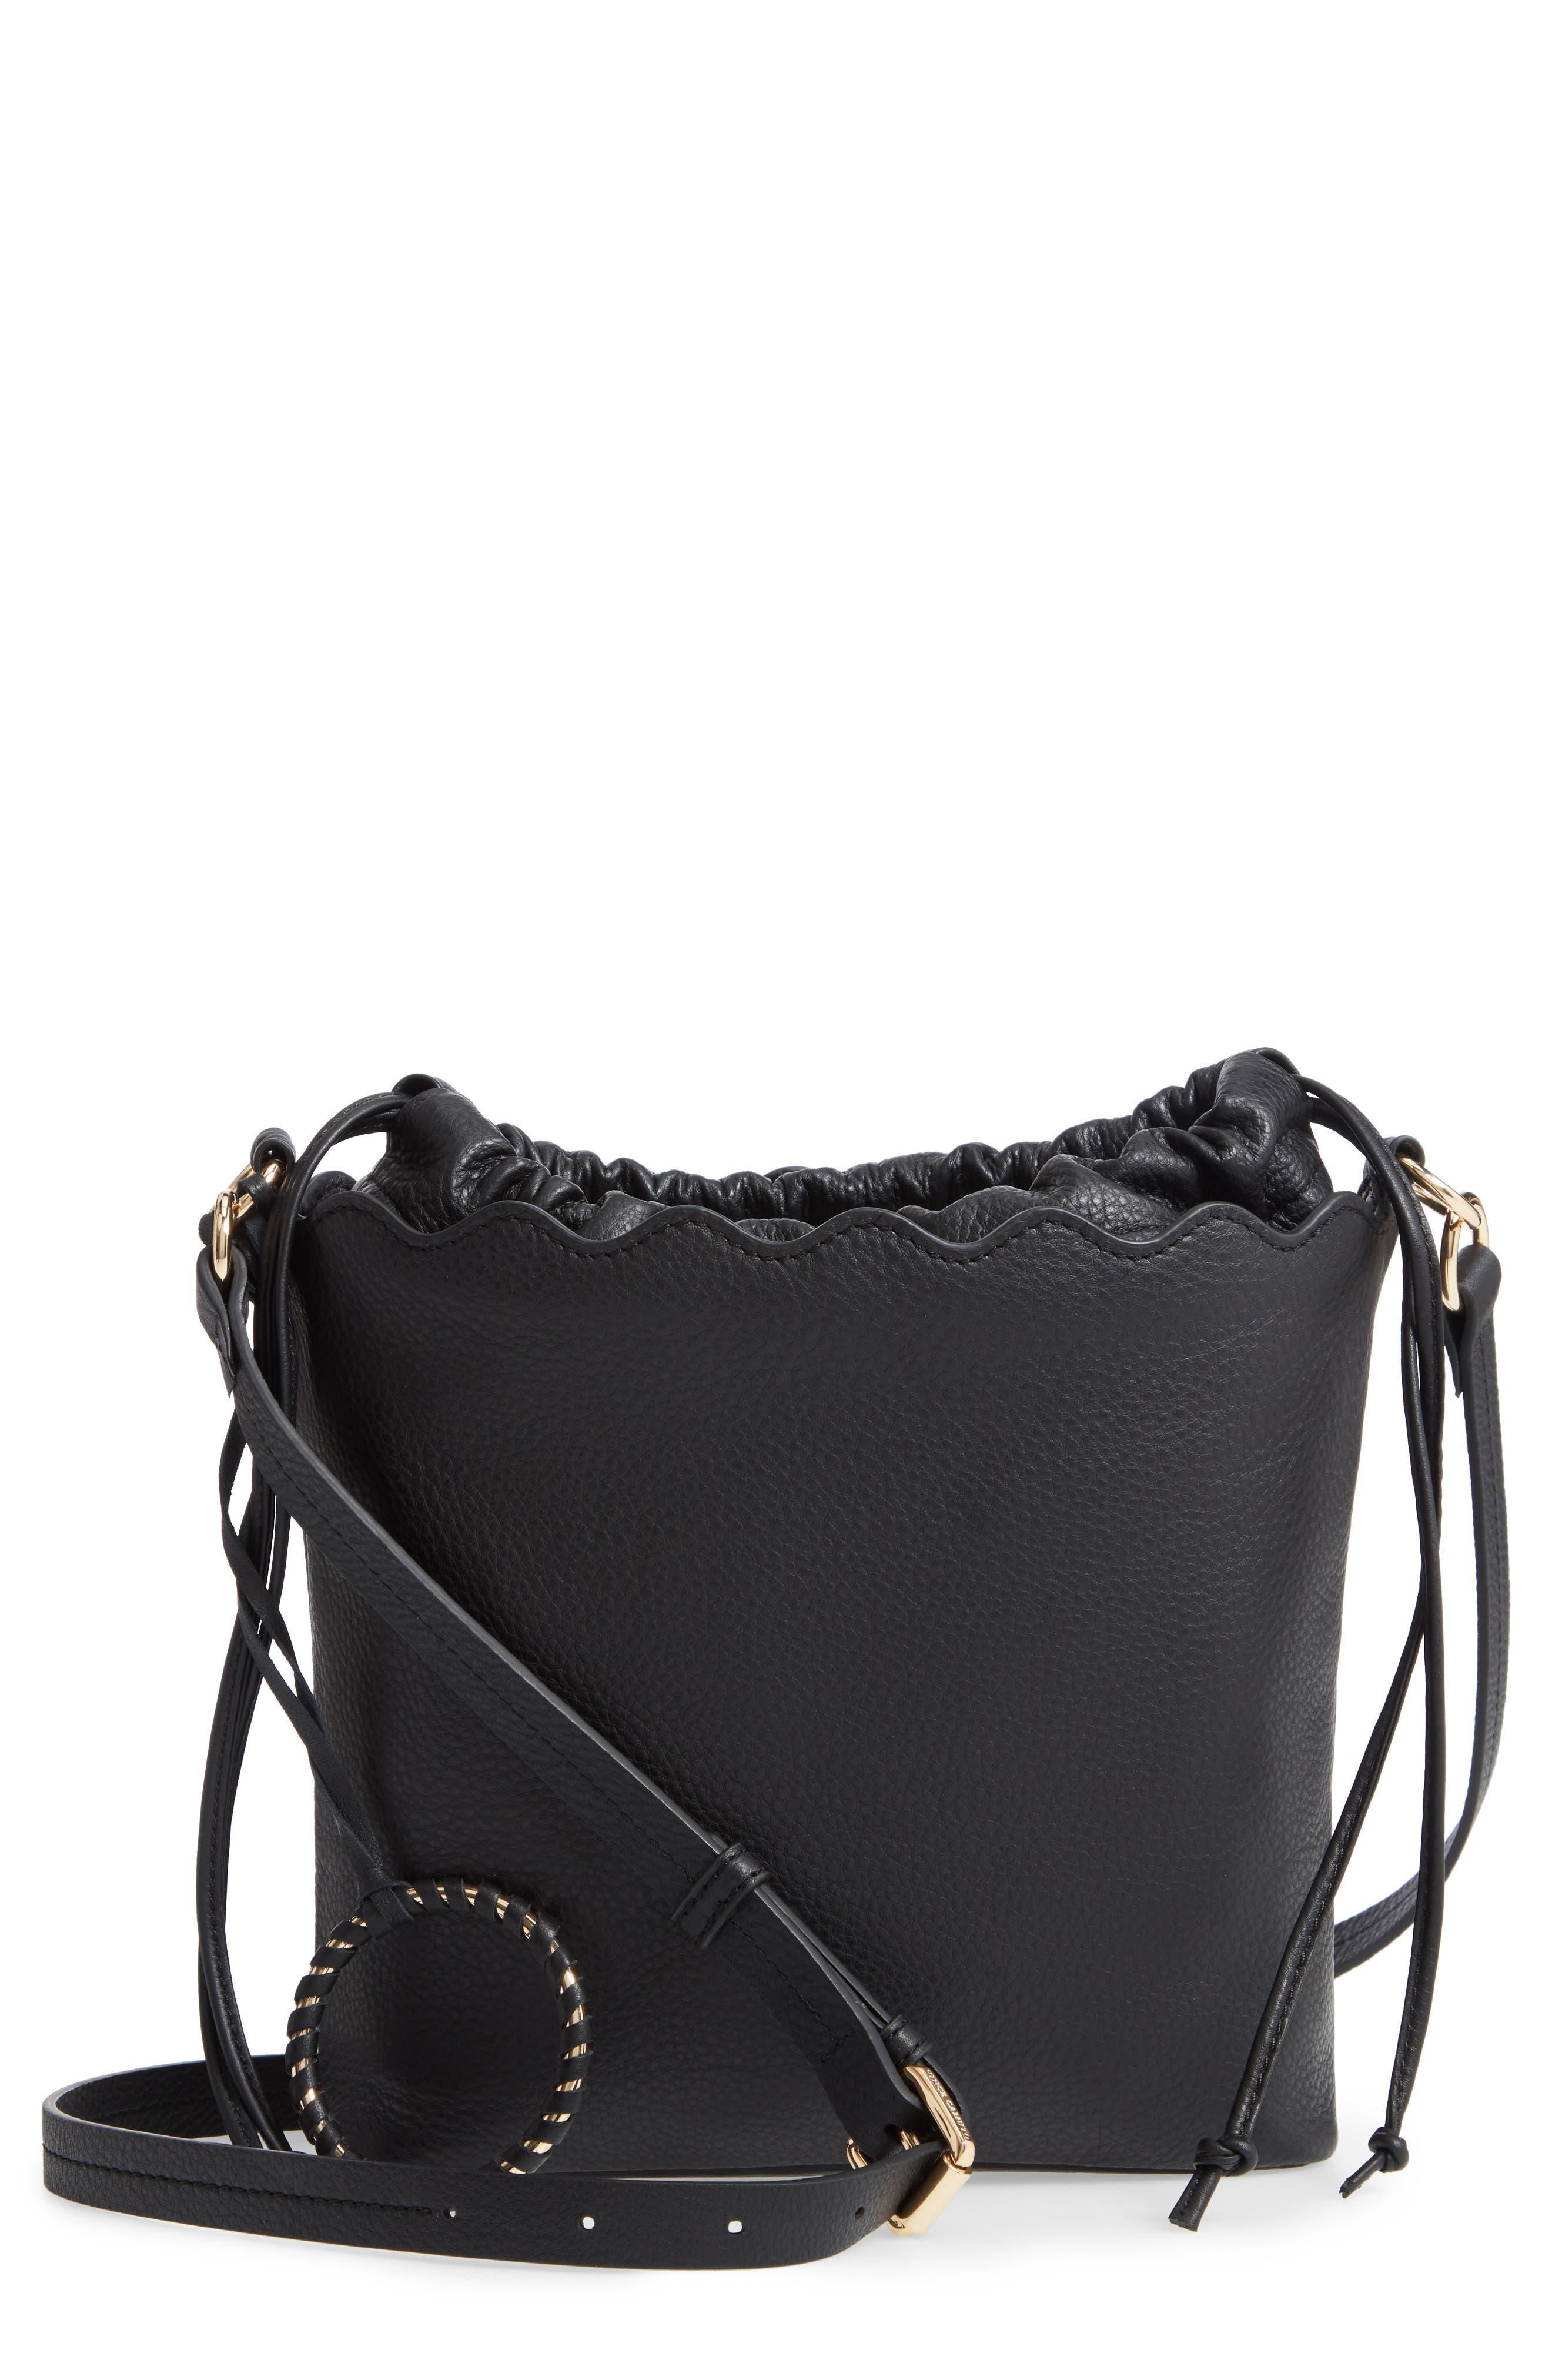 VINCE CAMUTO, Wavy Leather Bucket Bag, Main thumbnail 1, color, BLACK